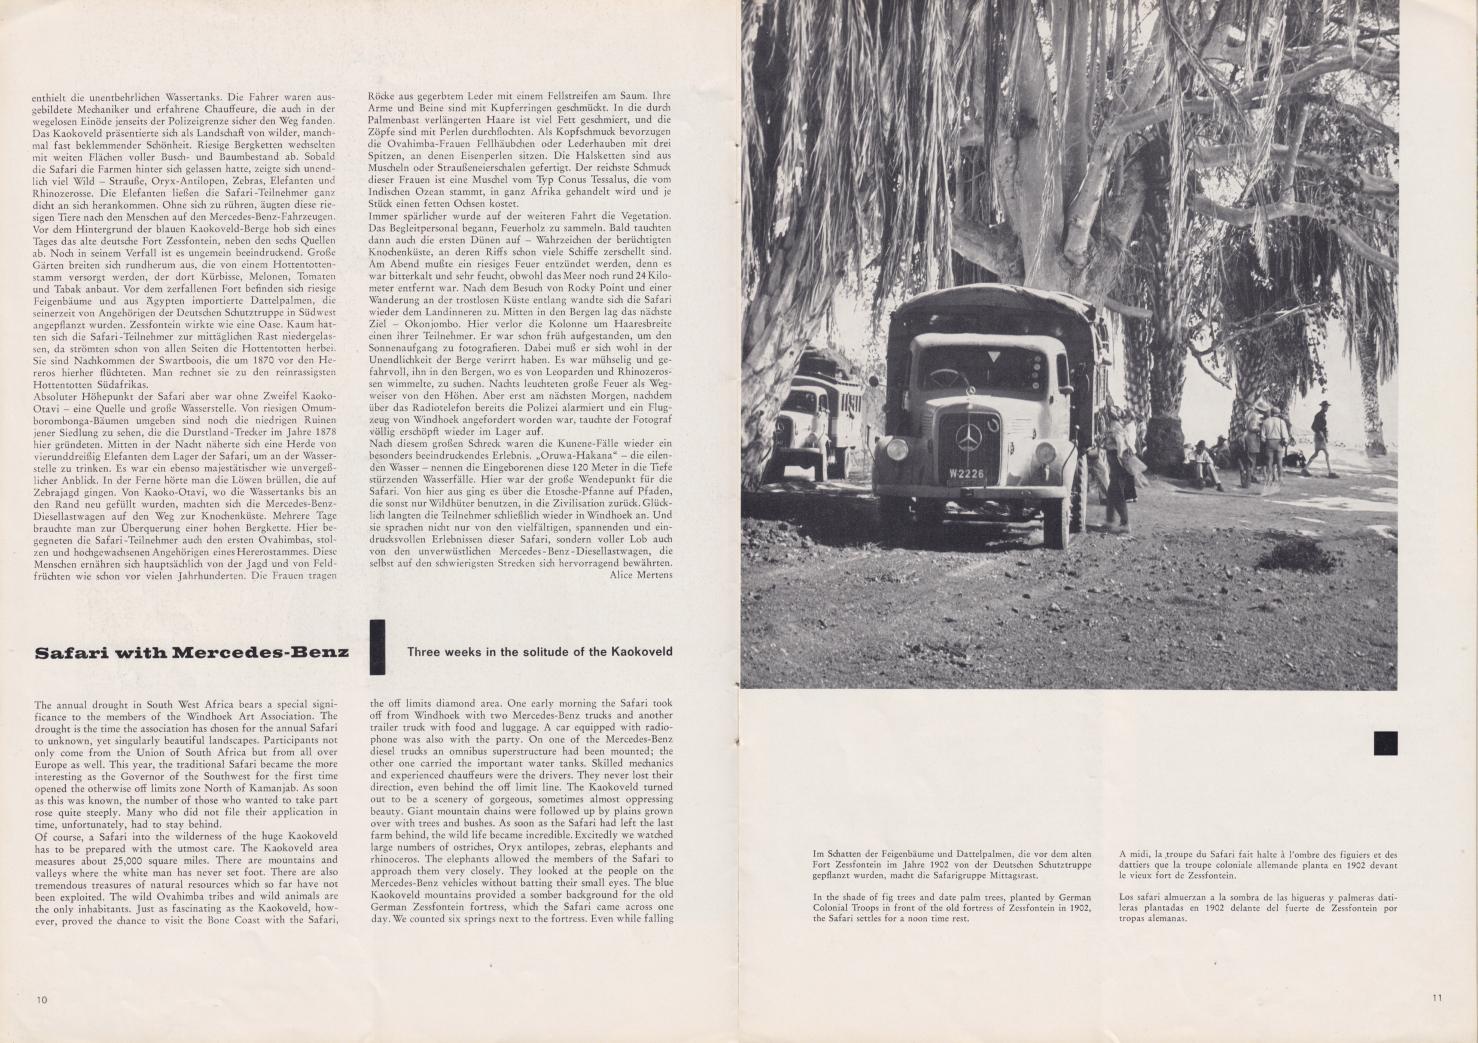 (REVISTA): Periódico In aller welt n.º 37 - Mercedes-Benz no mundo - 1959 - multilingue 006